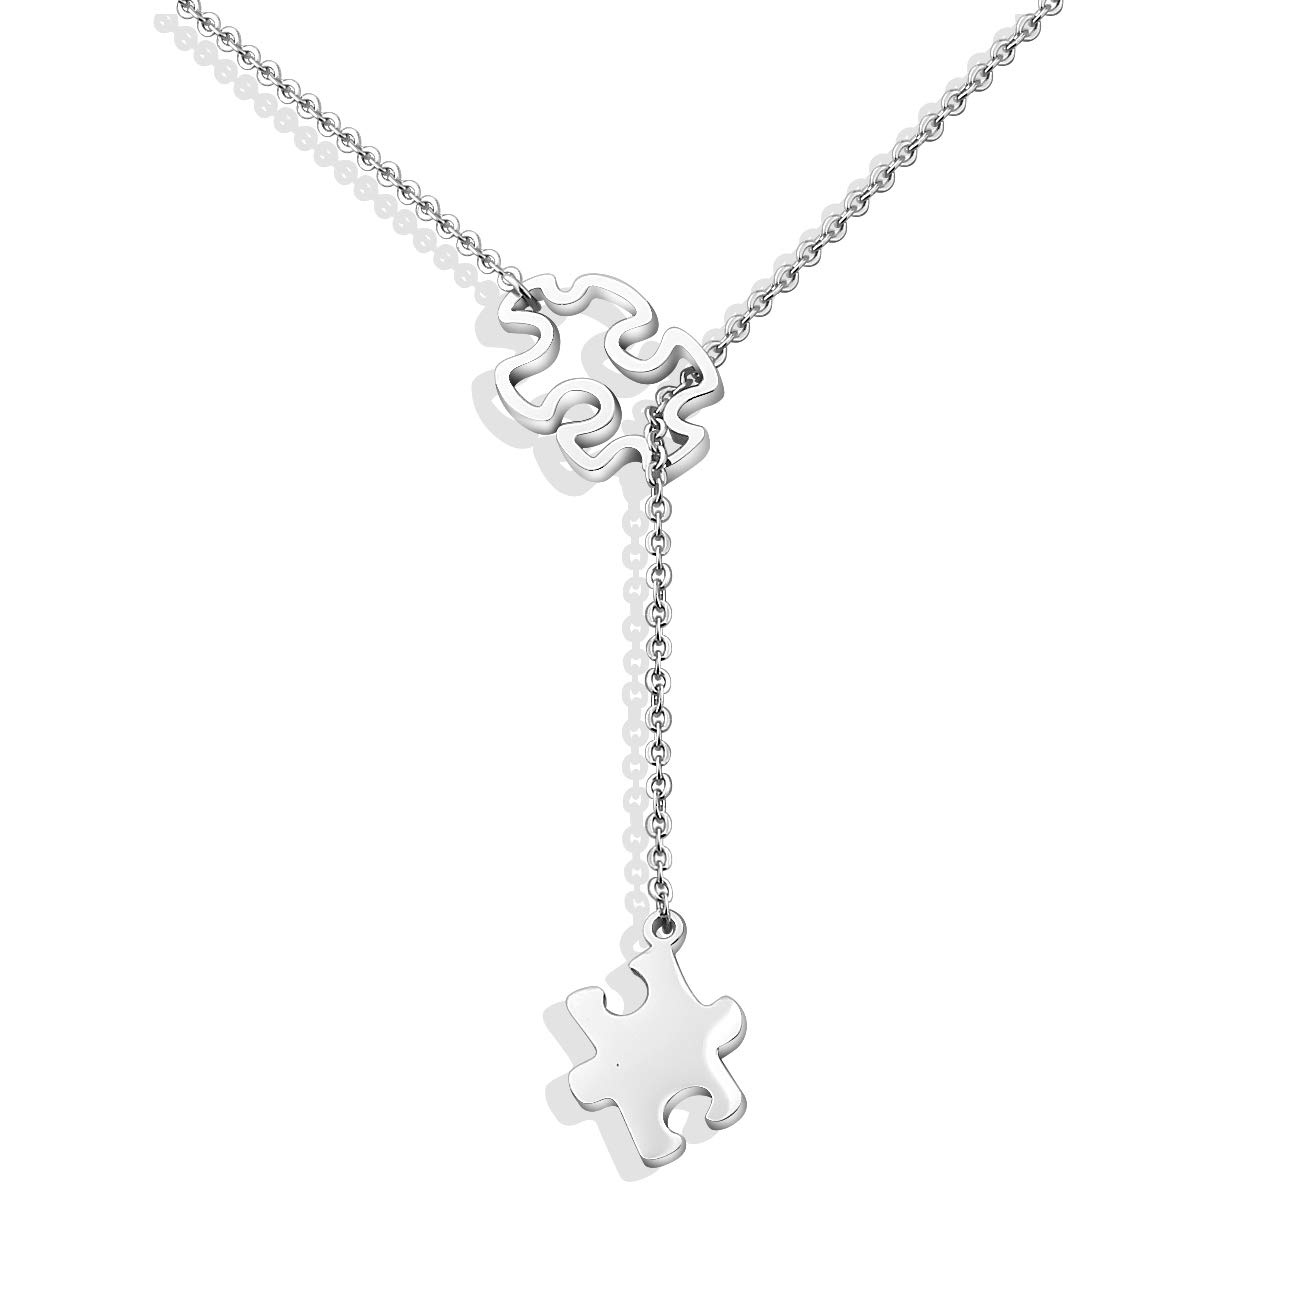 Autism Awareness Puzzle Lariat Necklace Motivational Autism Gift BNQL